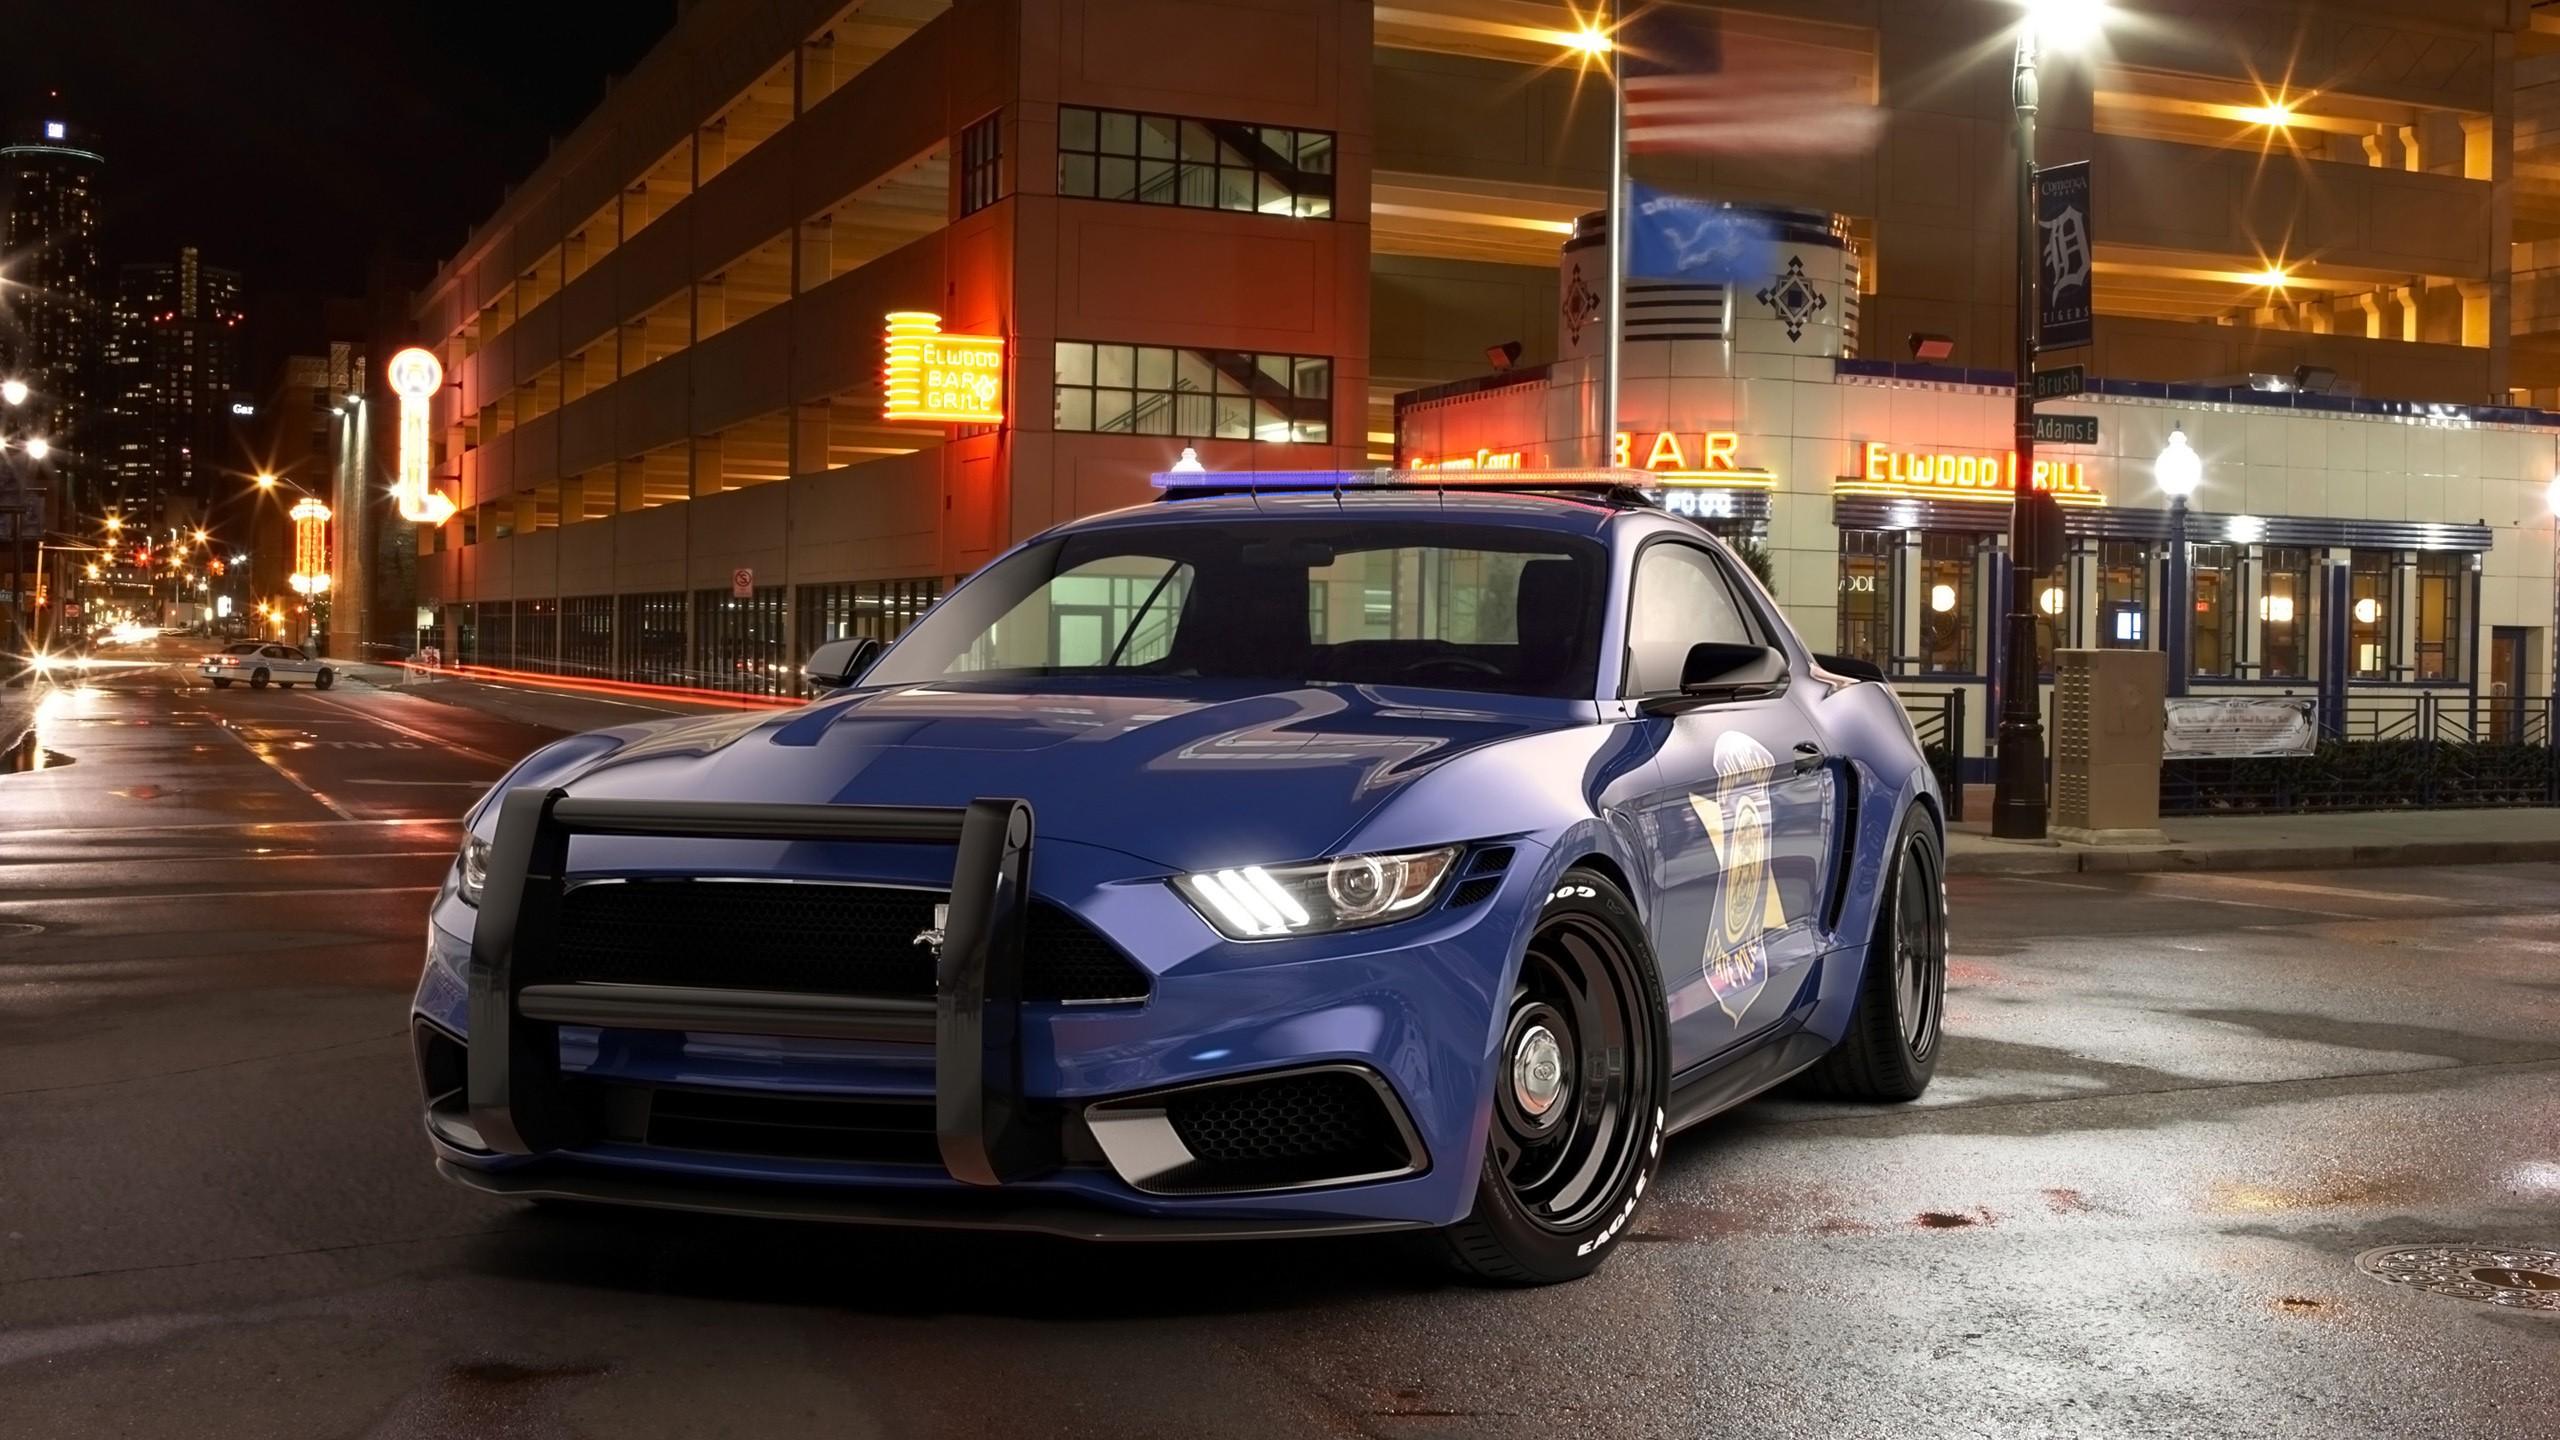 2017 Ford Mustang Notchback Design Police Wallpaper